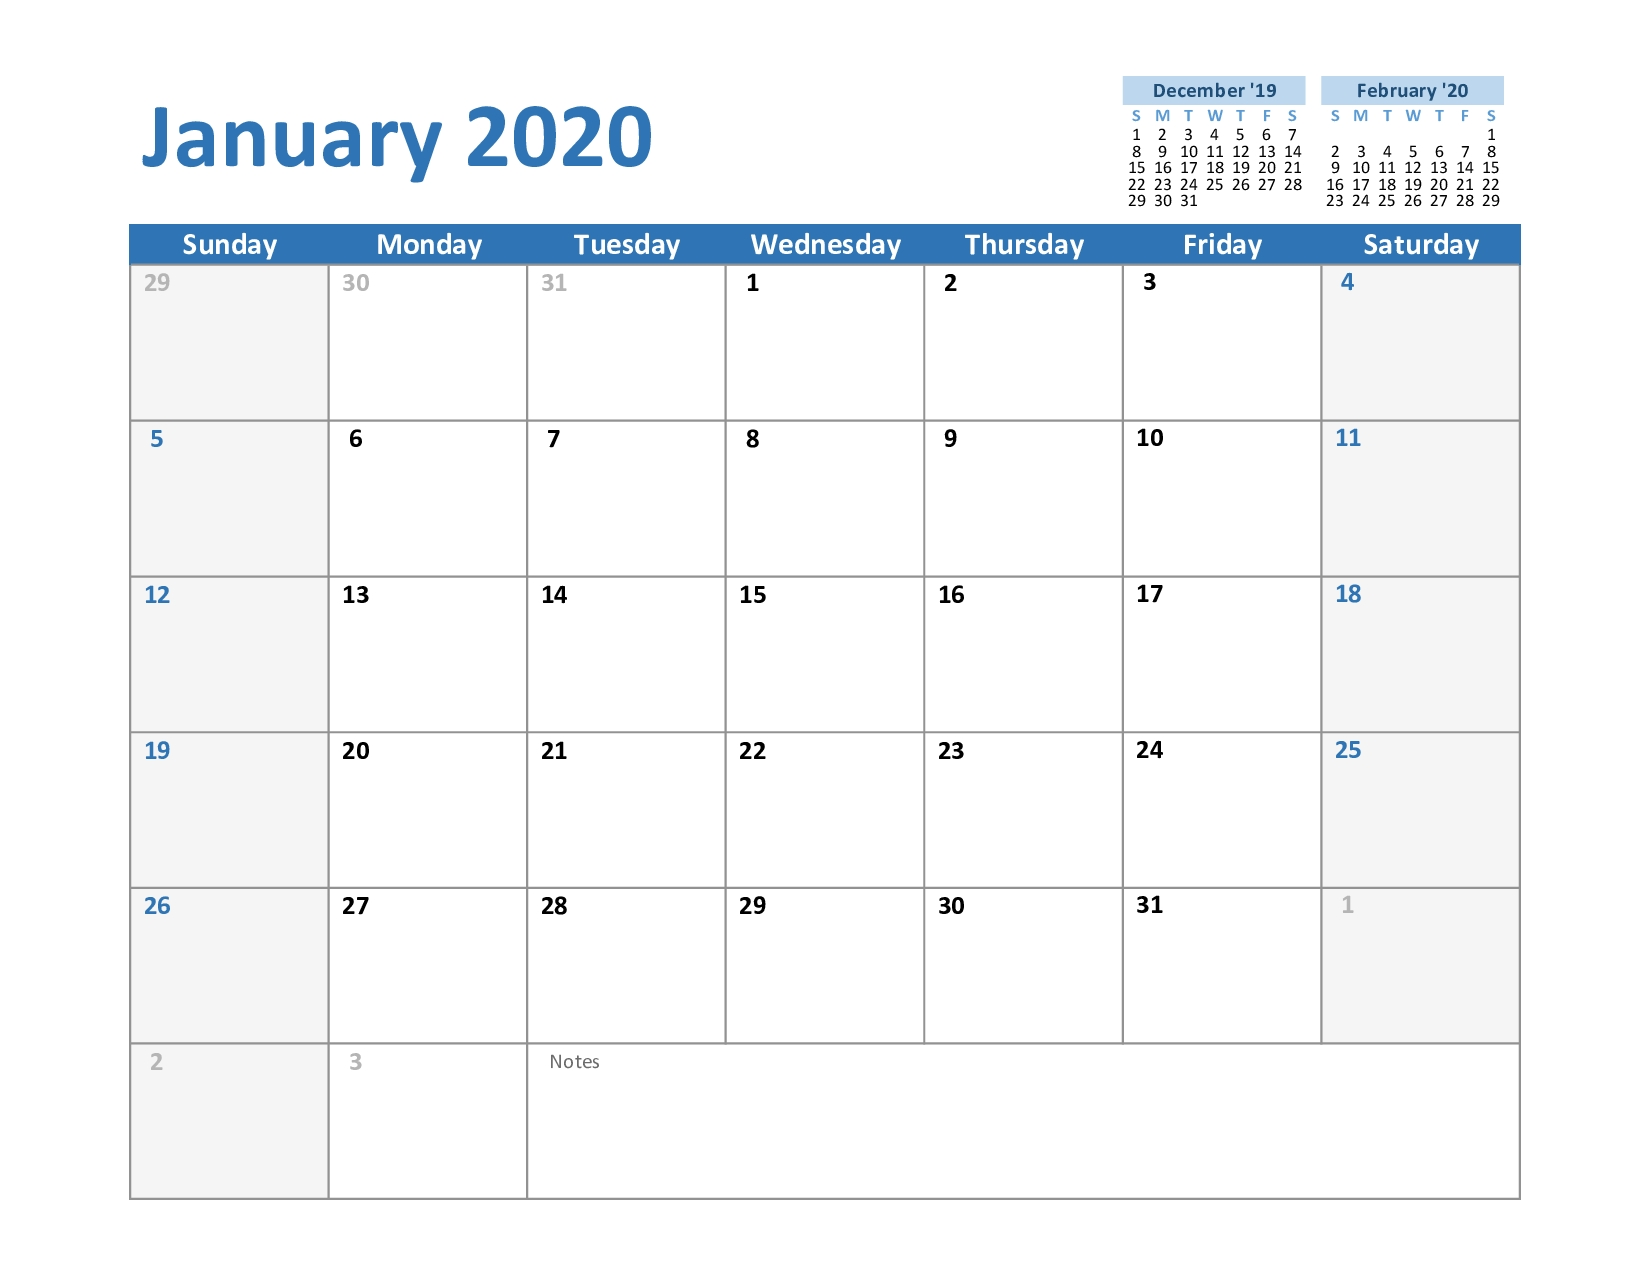 Printable January 2020 Calendar - Free Blank Templates-Free Printable Attendance Calendars 2020 Templates